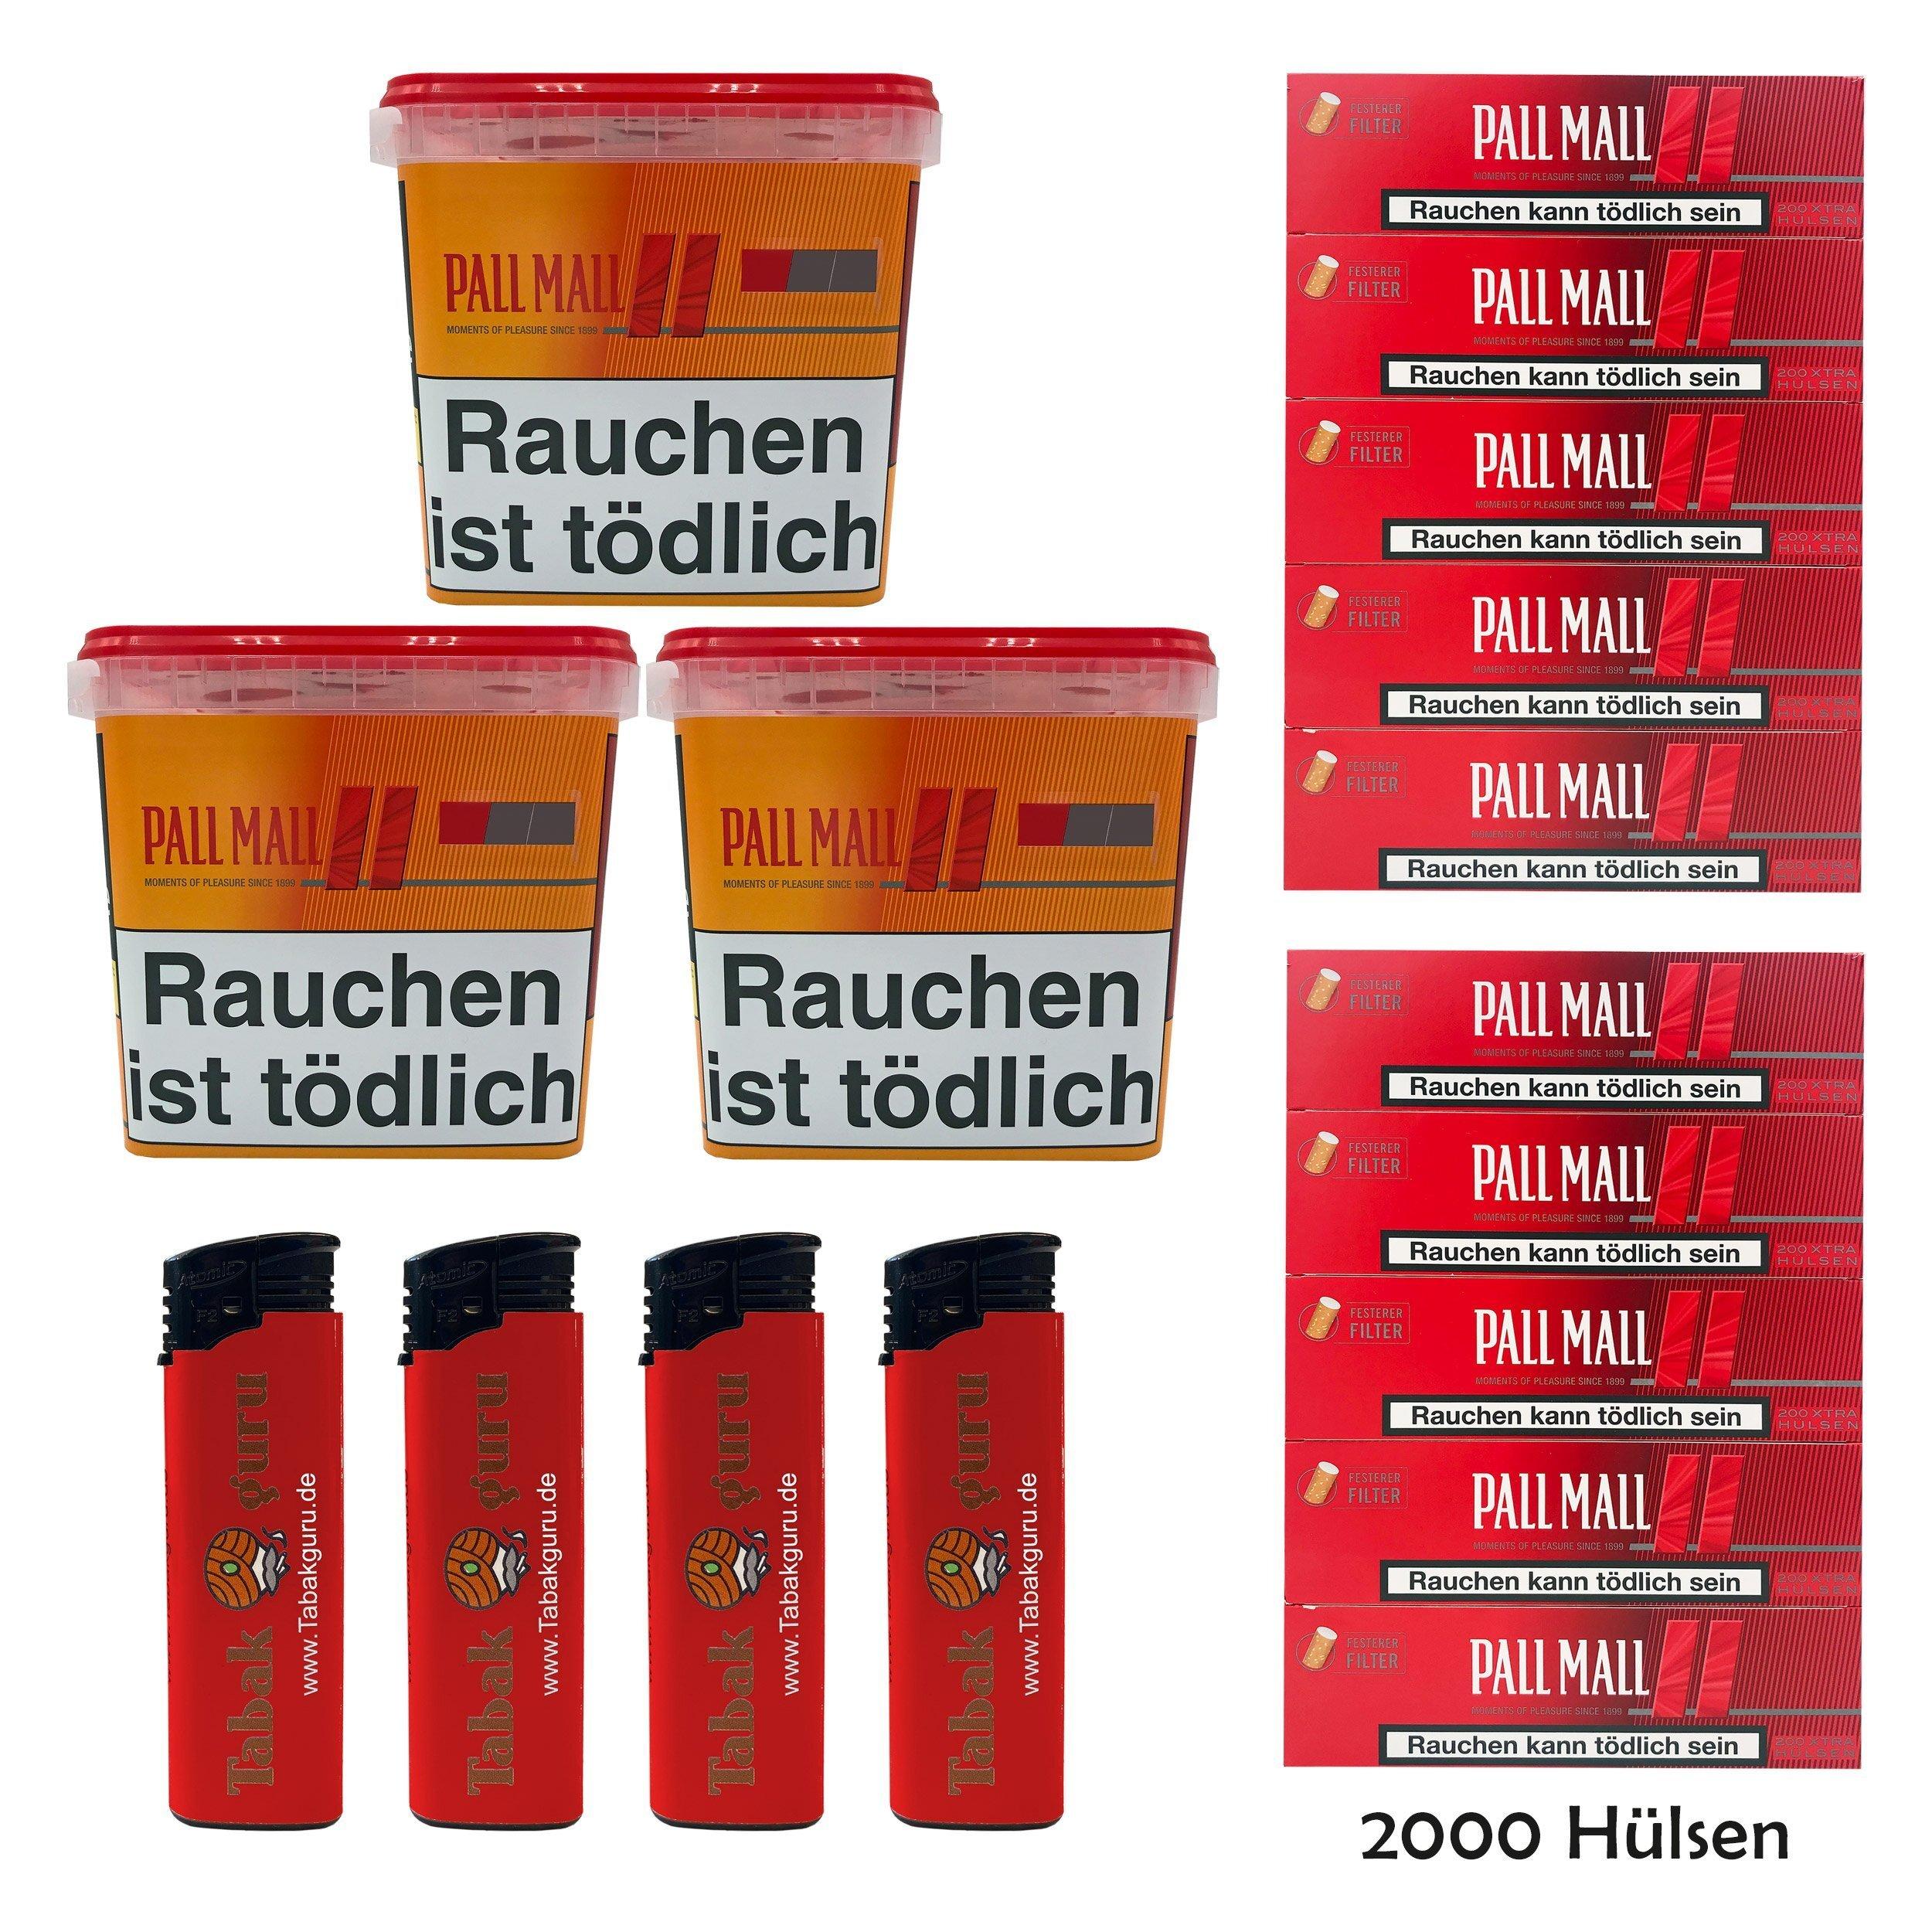 3x Pall Mall Allround Giga Box 260 g Tabak/Volumentabak, Red Xtra Hülsen, Feuerz.